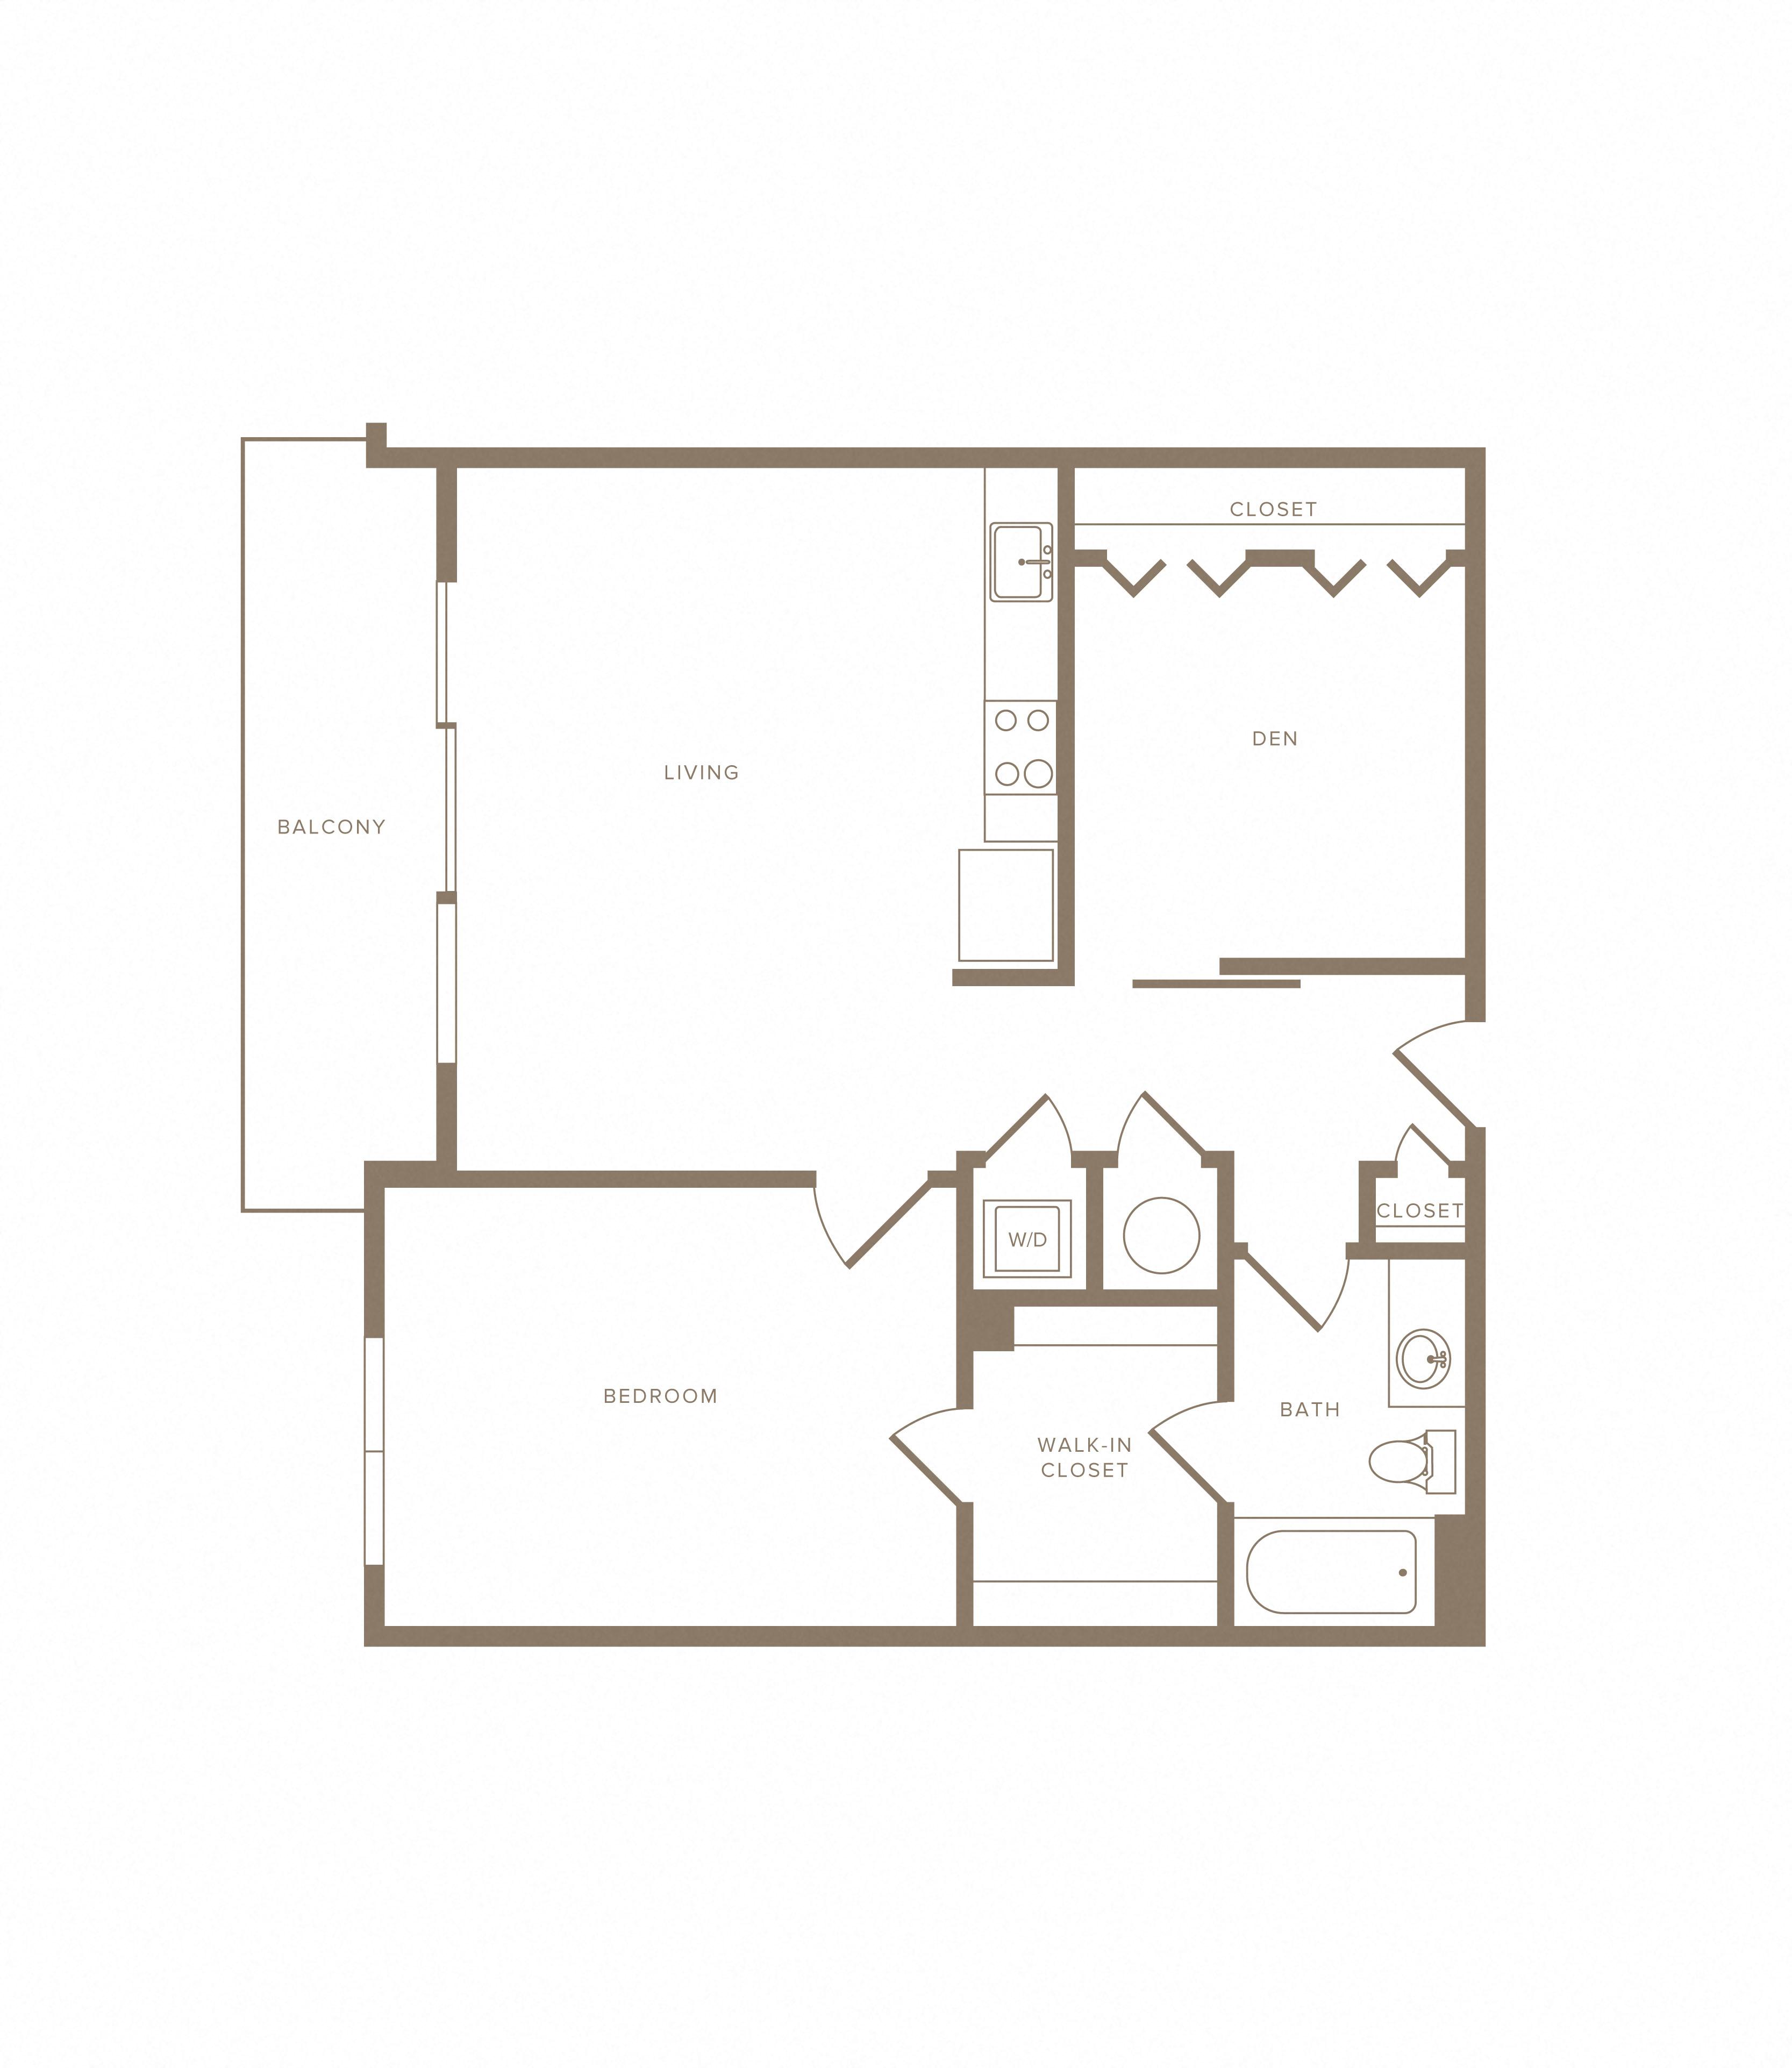 Apartment A-719 floorplan